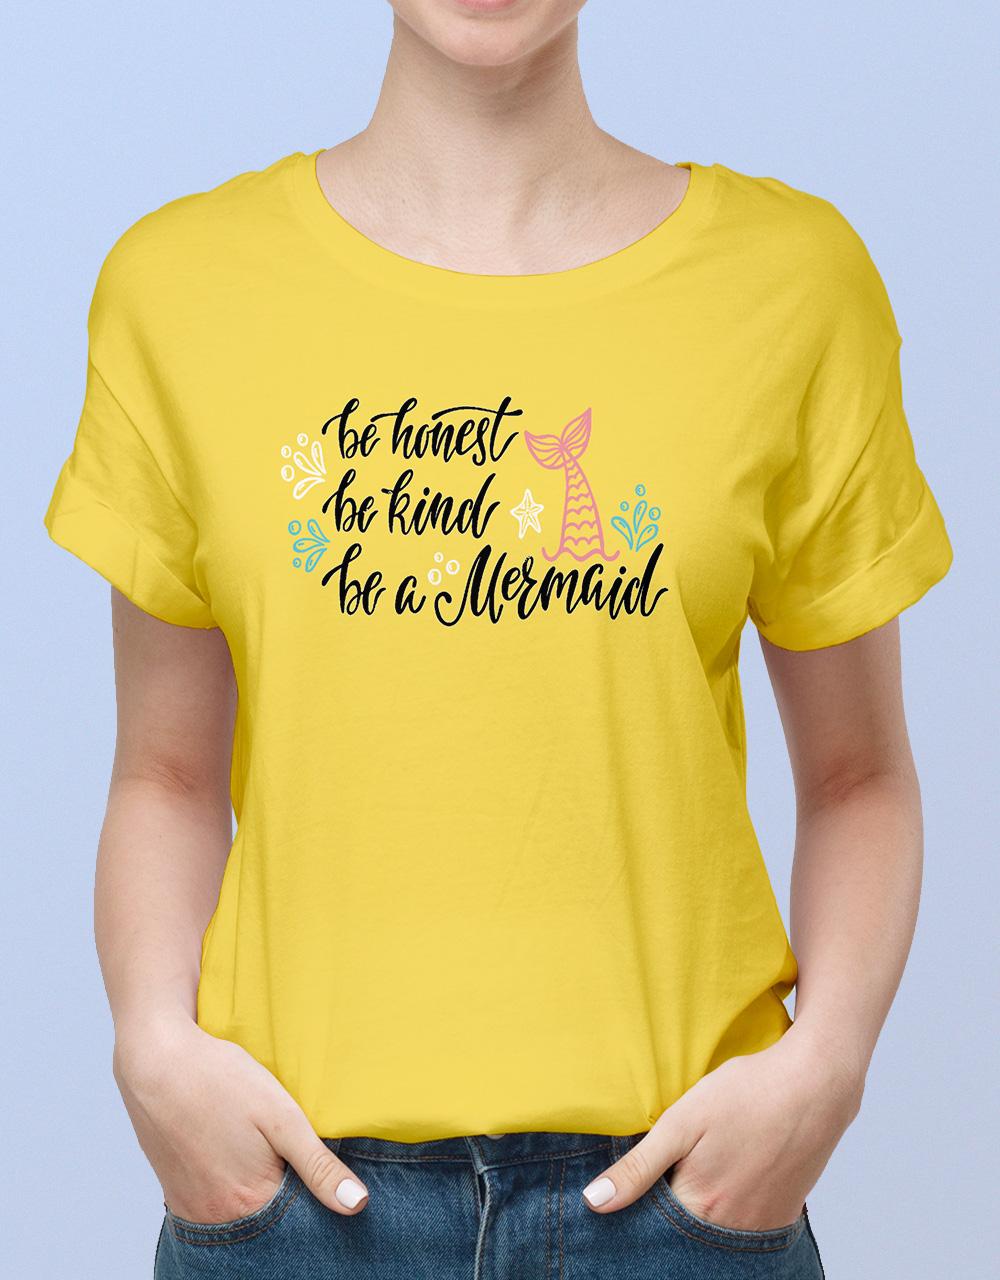 Camiseta mujer amarilla sirena